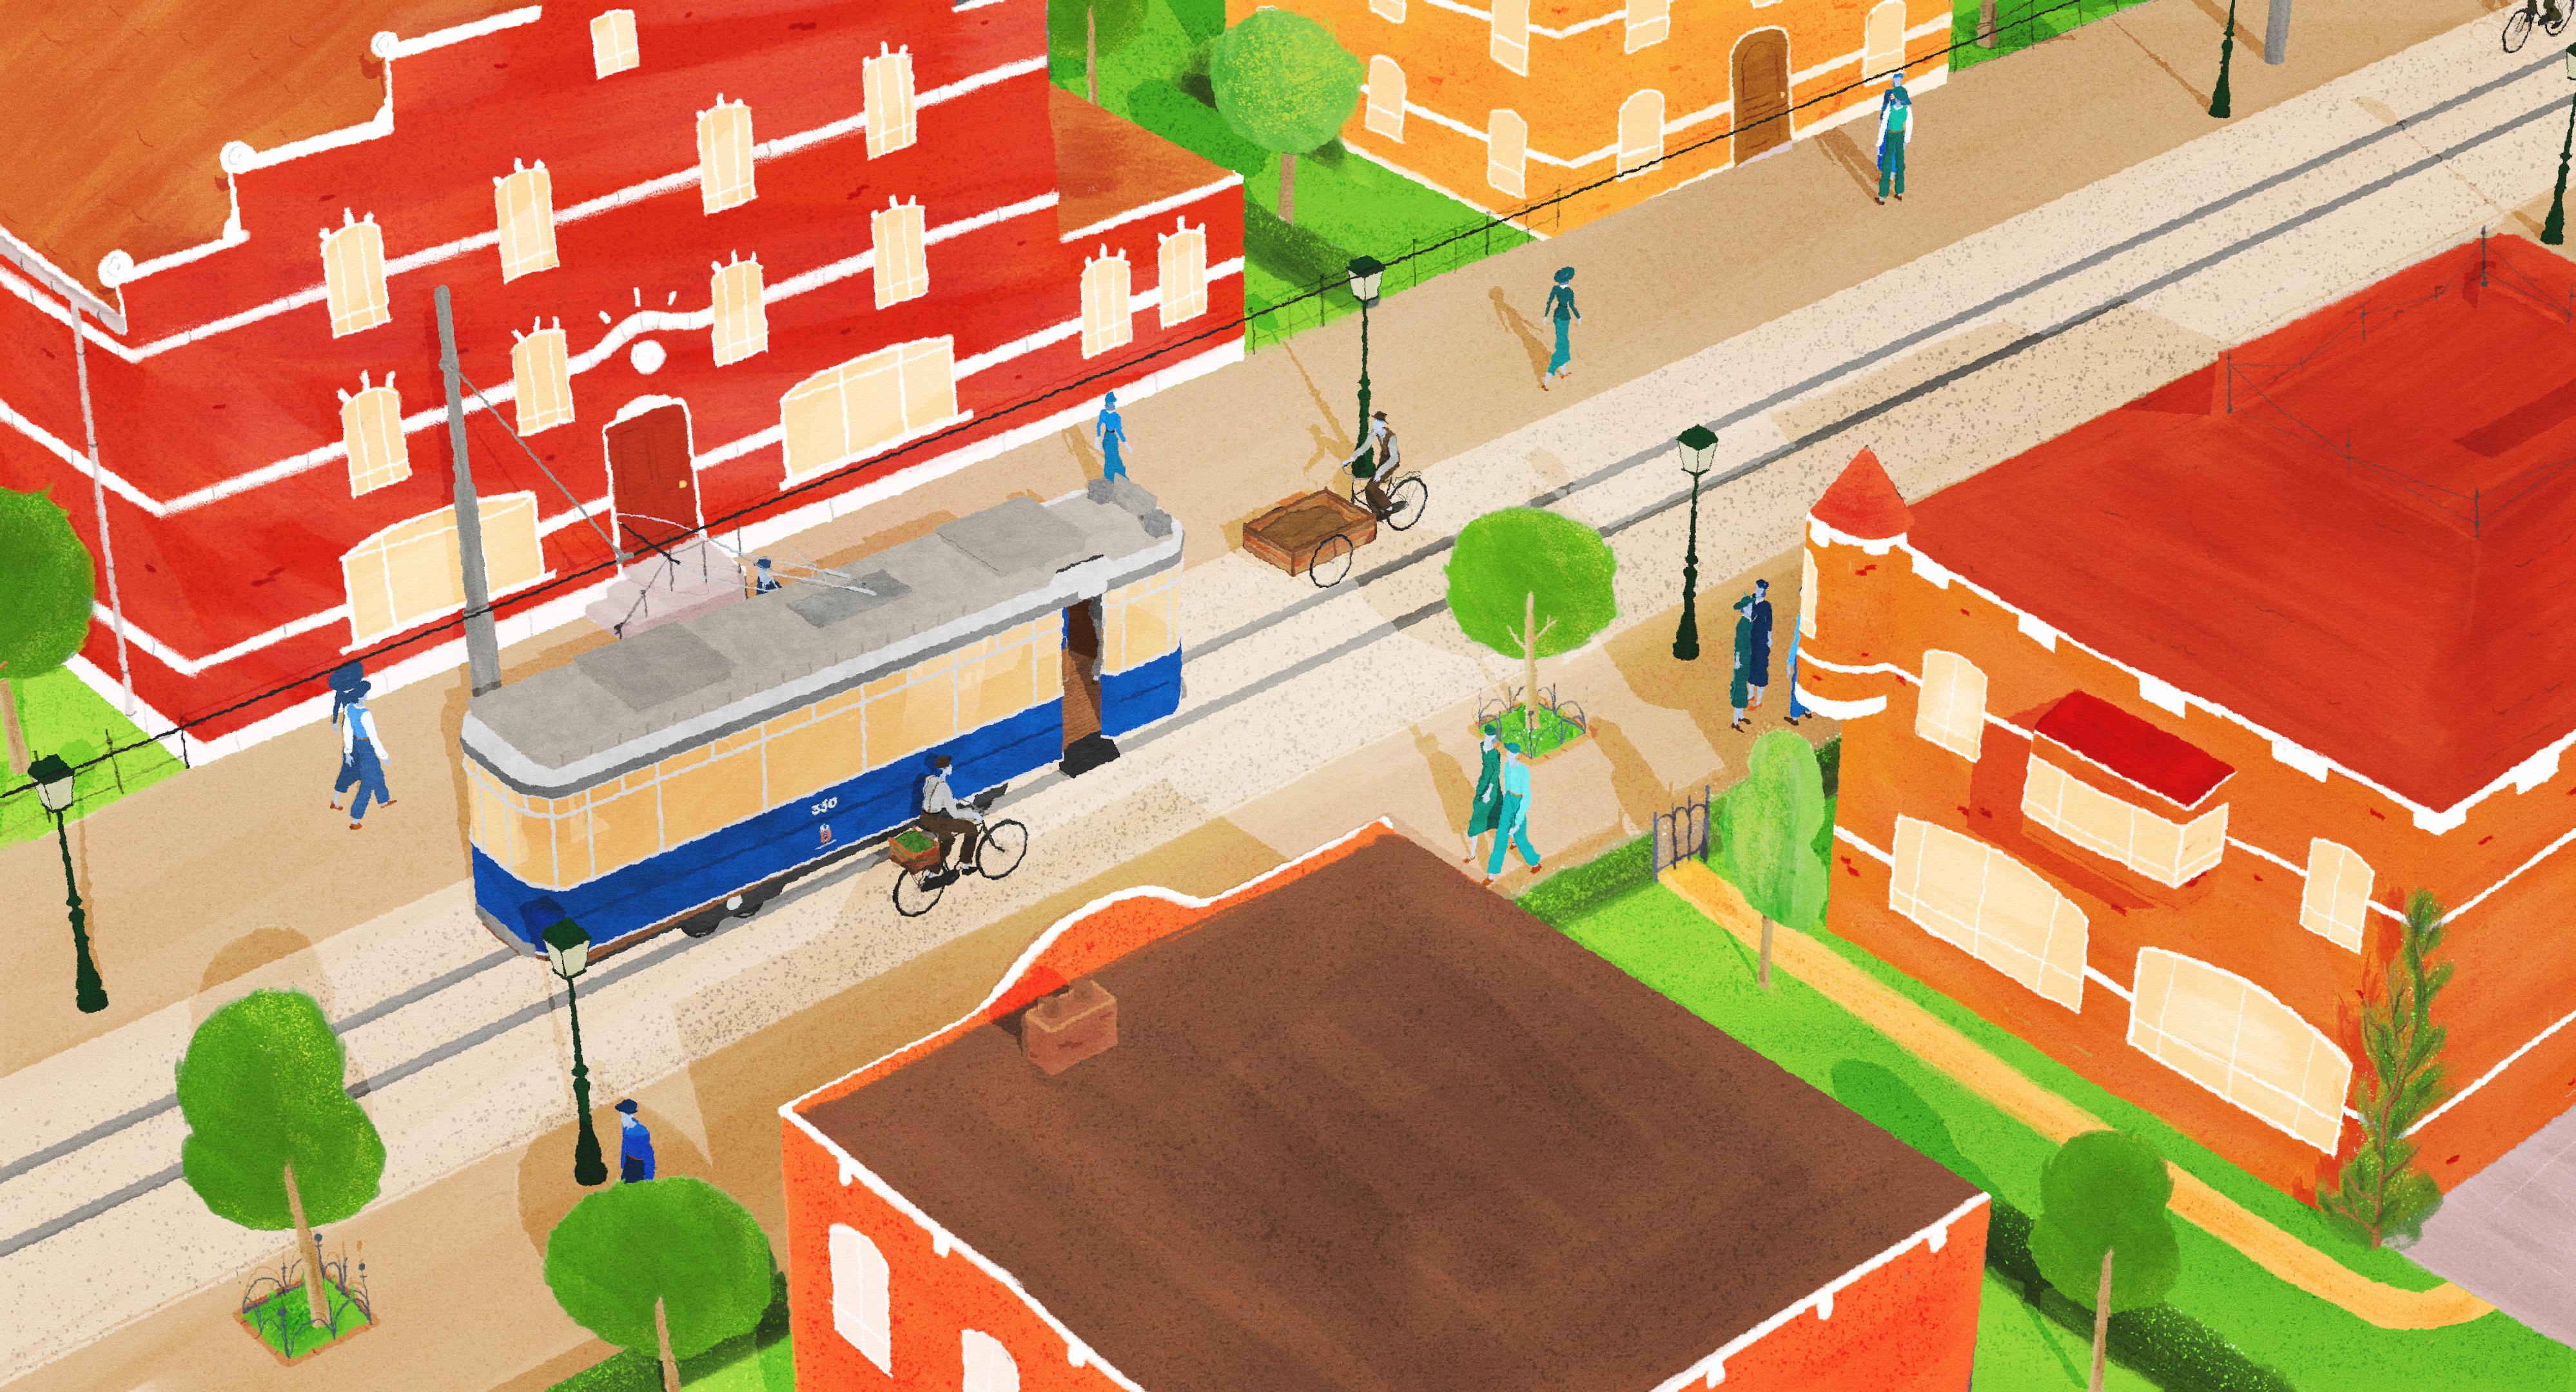 Tram_Still_03_RGB